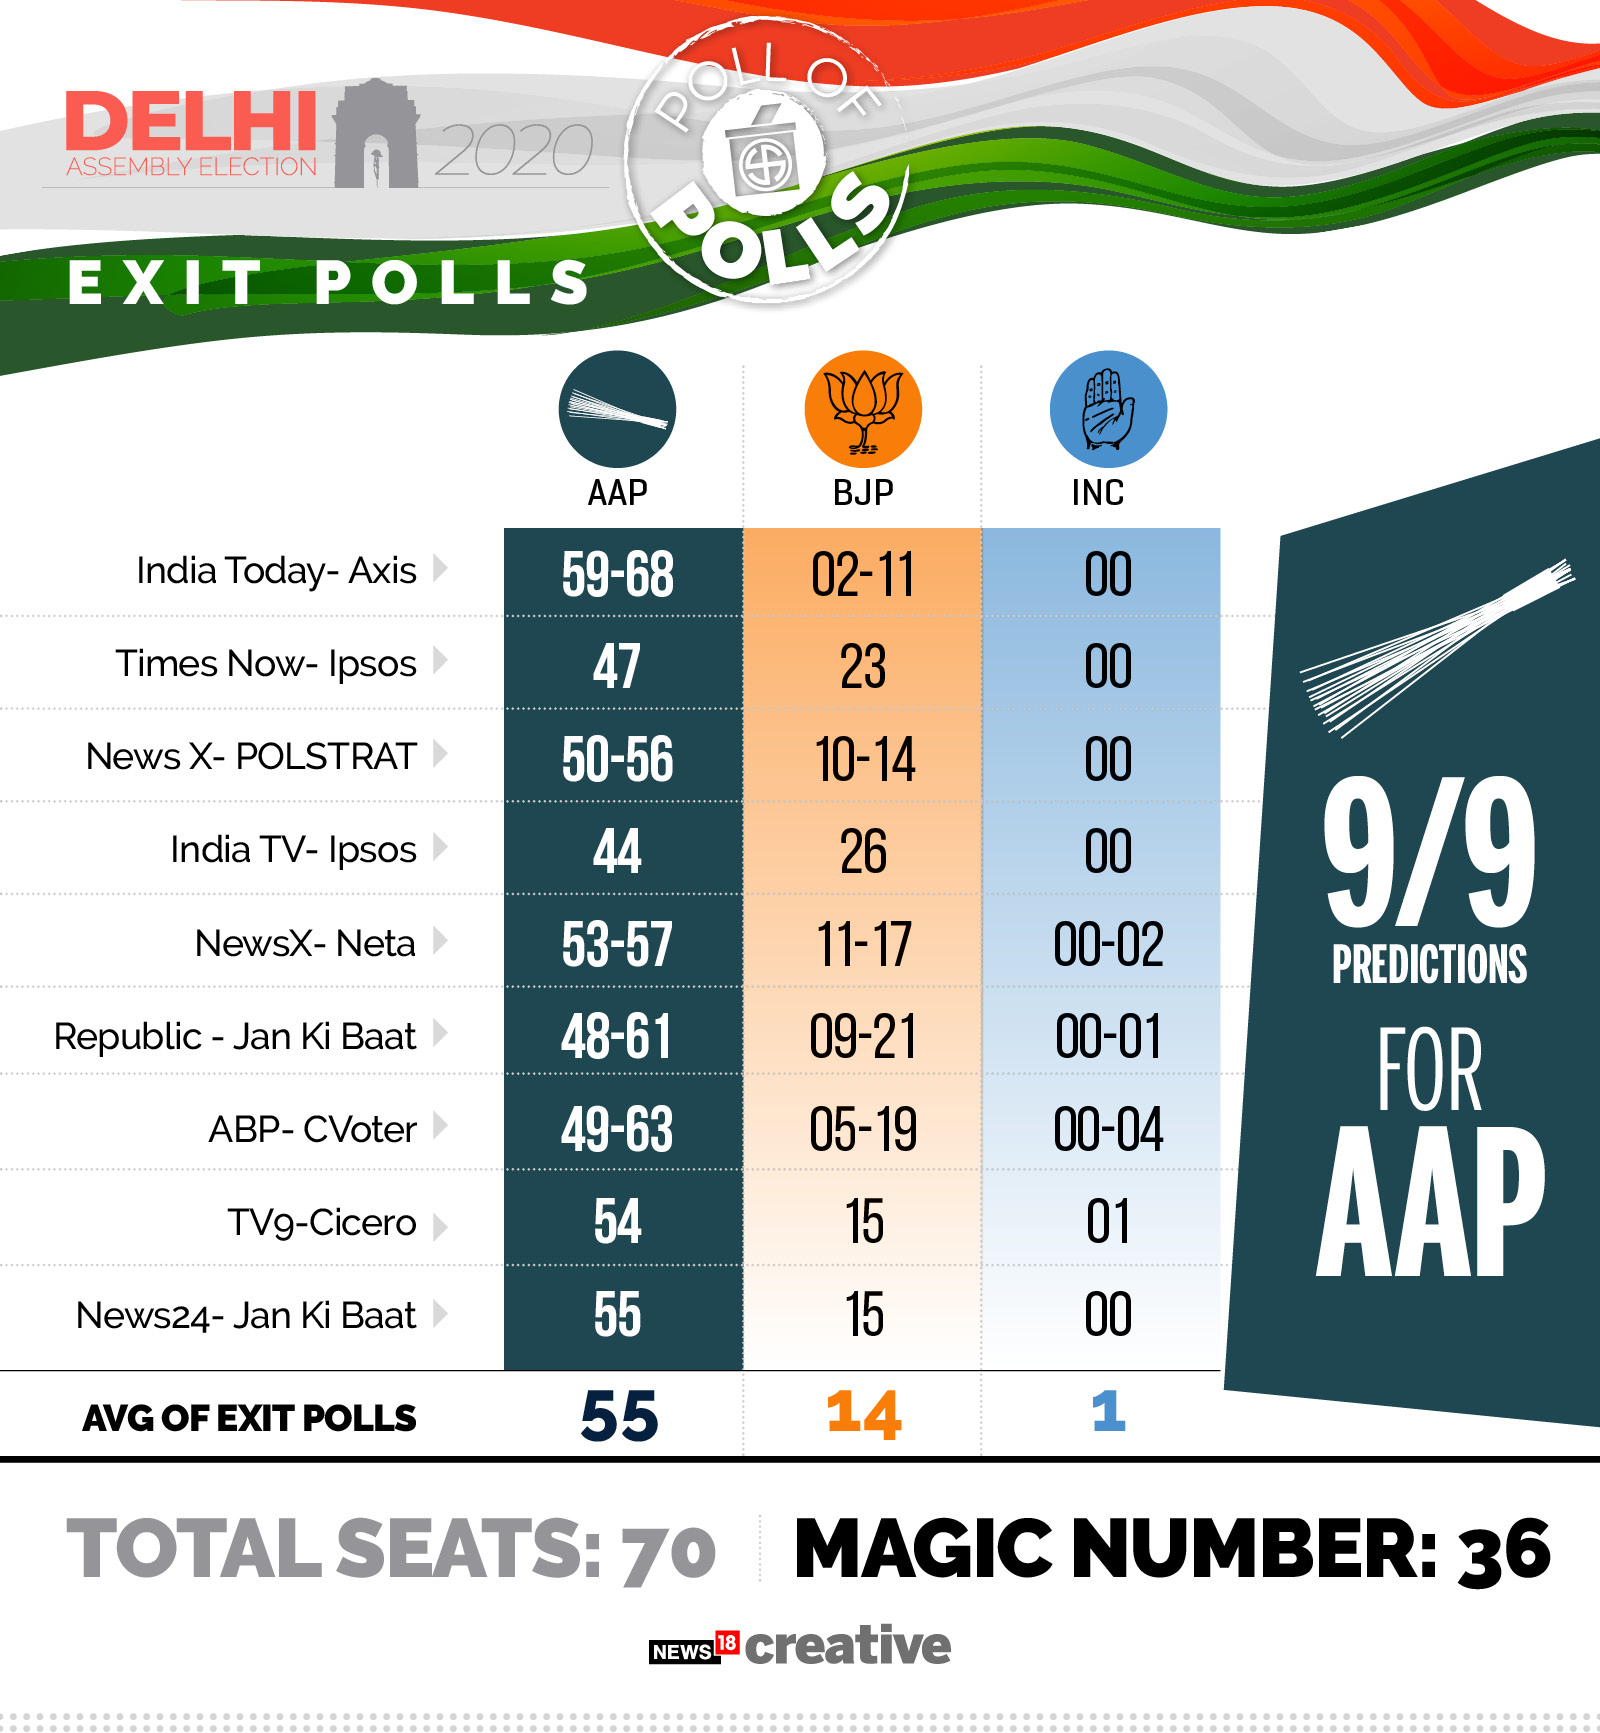 Delhi Election Exit Poll Results 2020 Highlights Surveys Predict